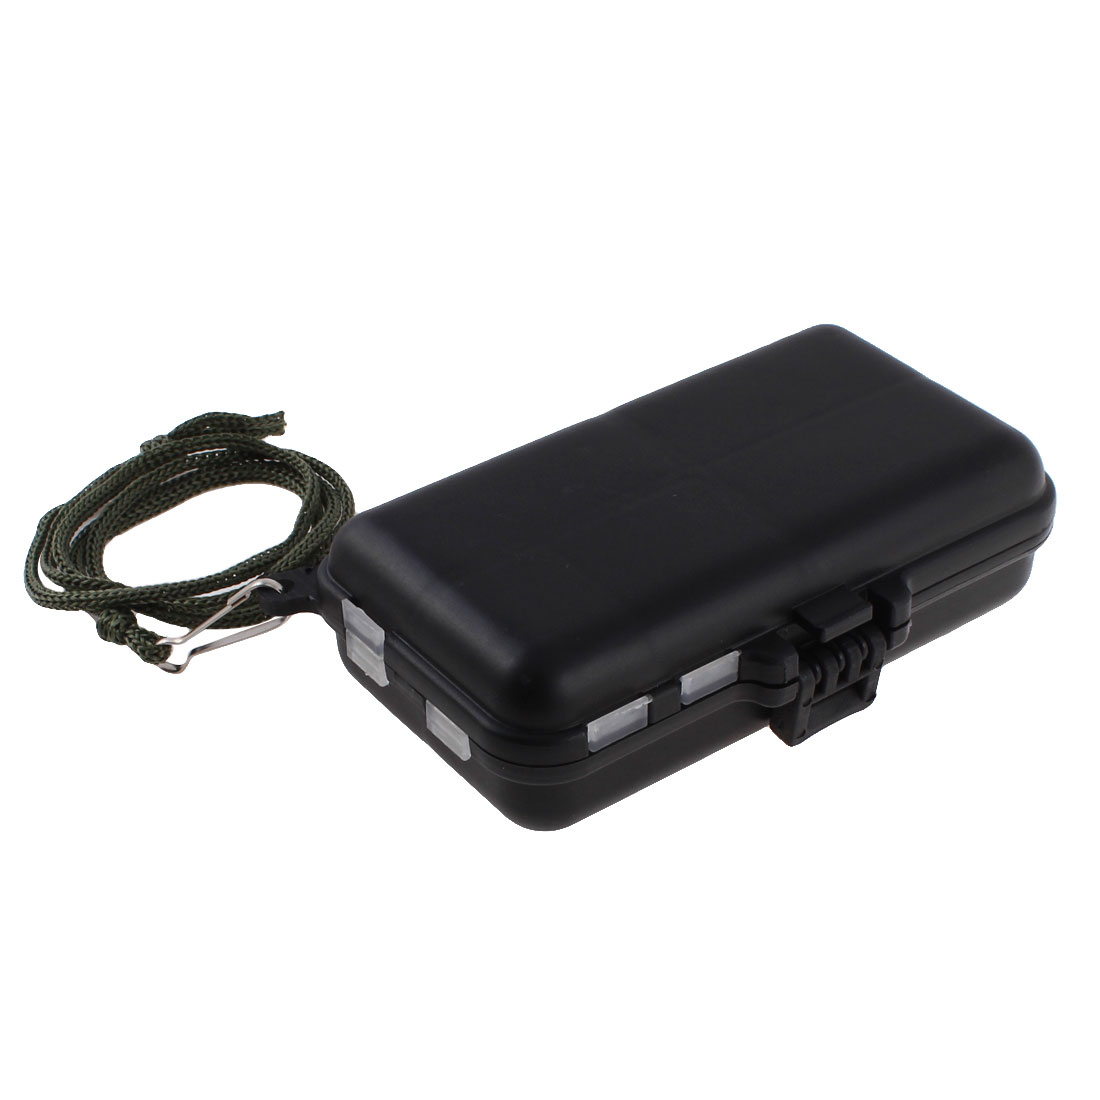 Plastic Case 9 Compartments Fishing Hooks Holder Box Organizer Black